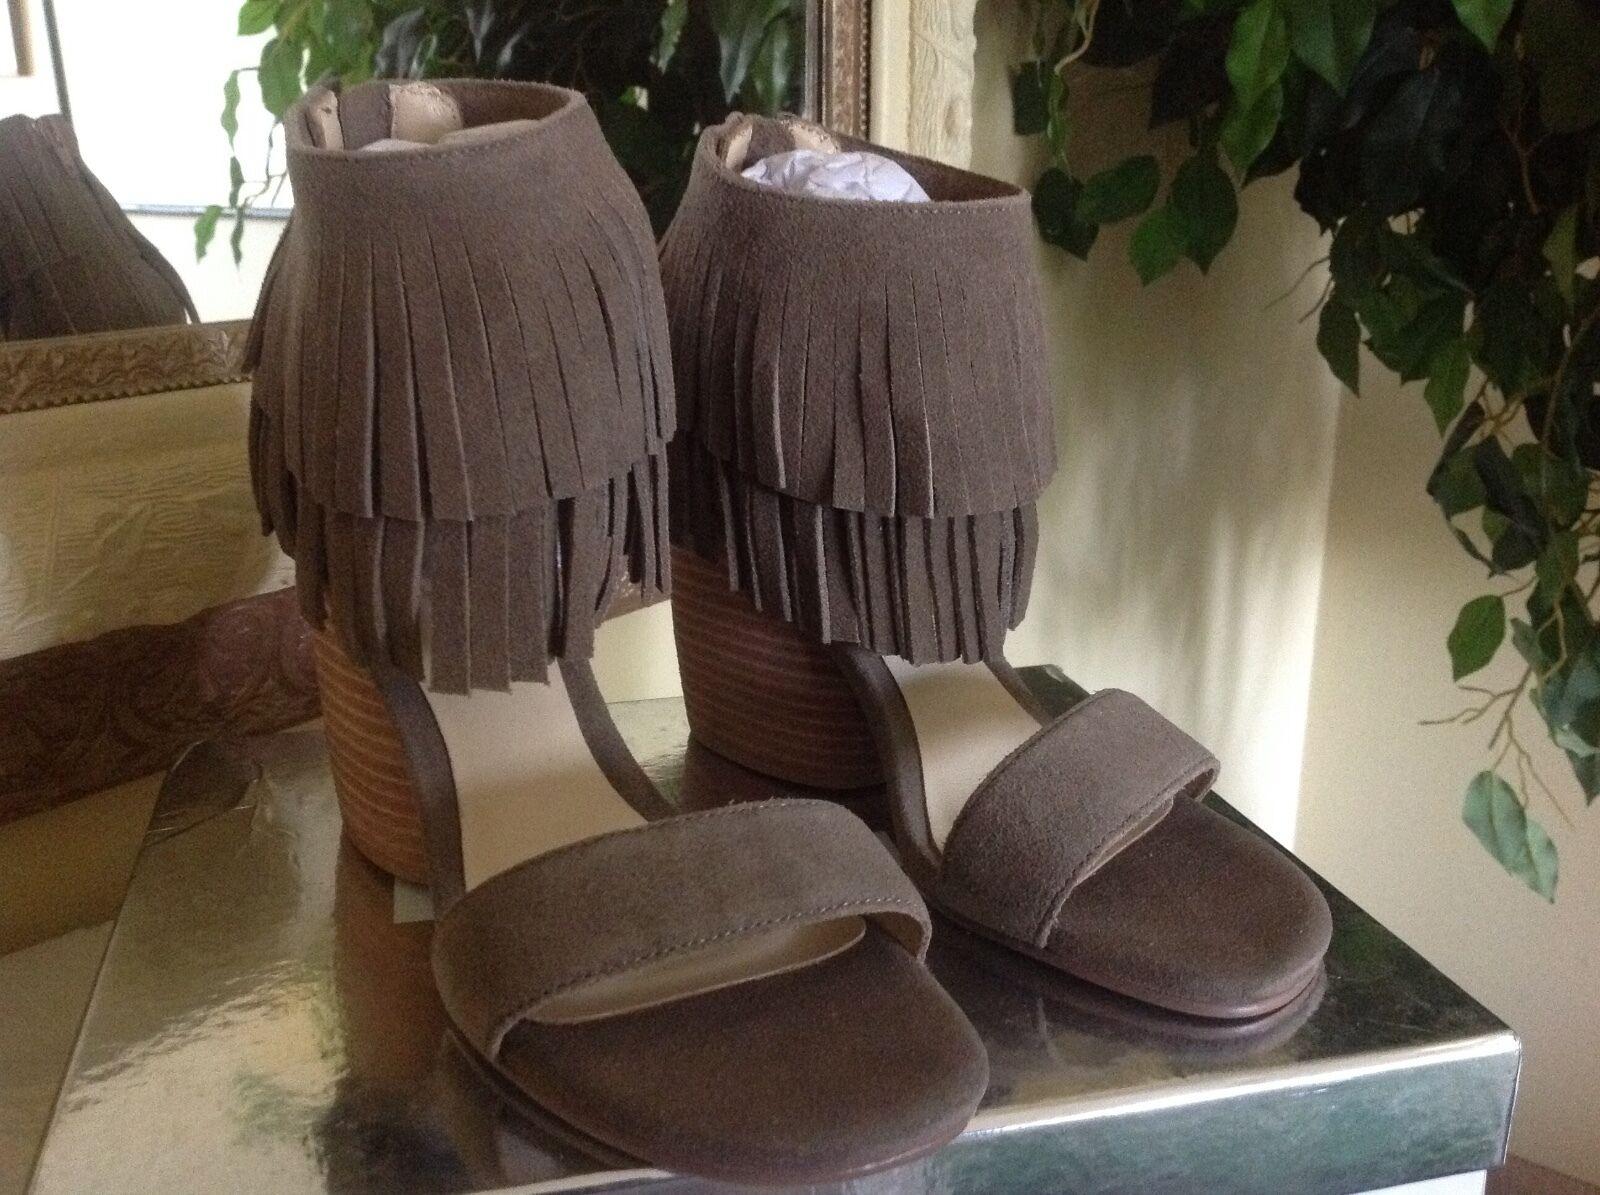 Matiko Desiree Damenschuhe Taupe Suede Fringe Ankle Wedge 155 Heel Sandale EU37 MSRP 155 Wedge a8ac88